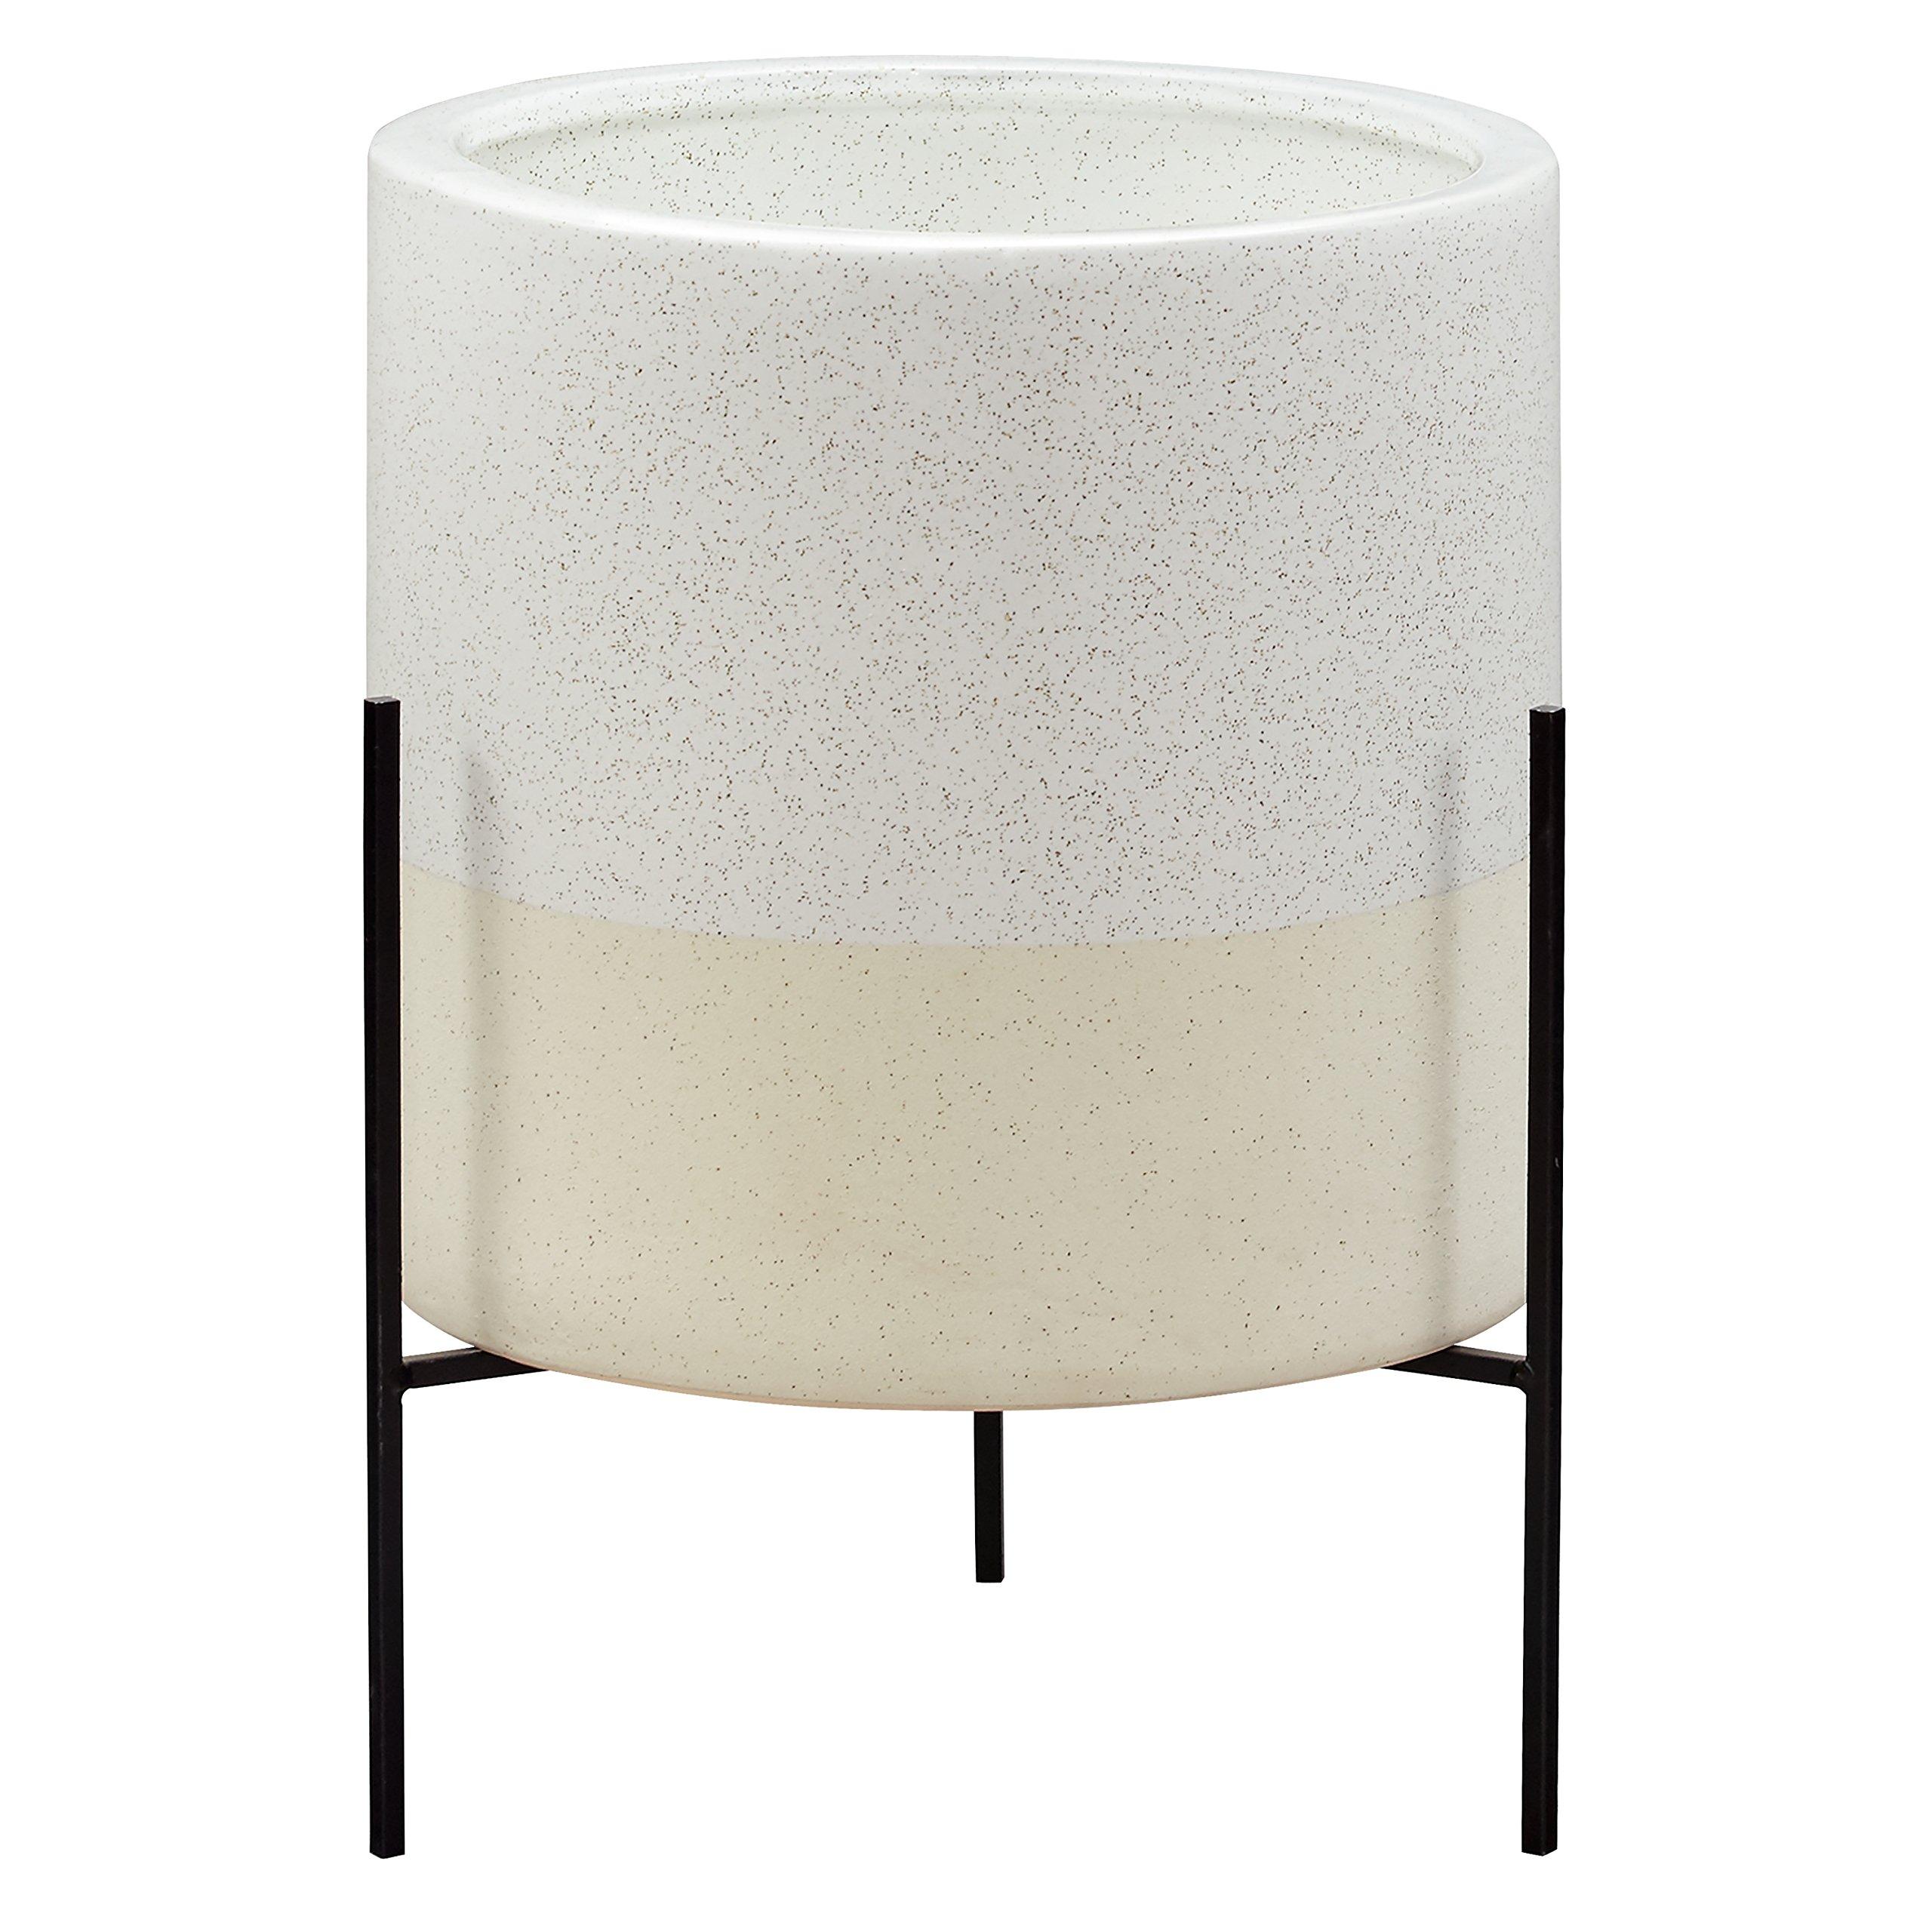 Rivet Mid-Century Ceramic Planter with Stand, 17''H, White